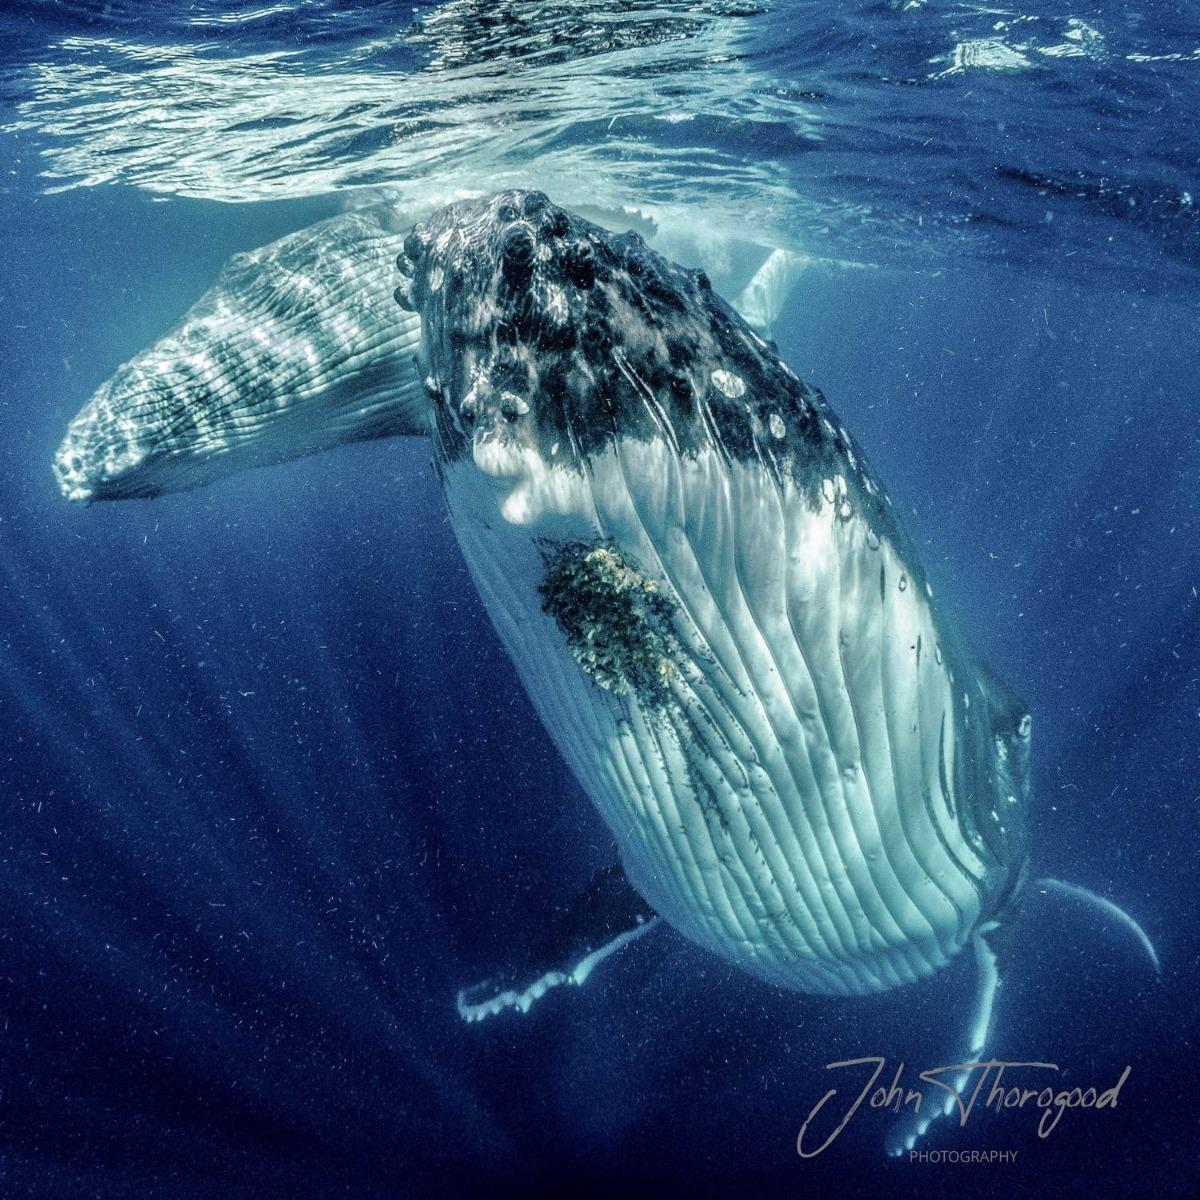 Humpback Whale in Tonga. John Thorogood